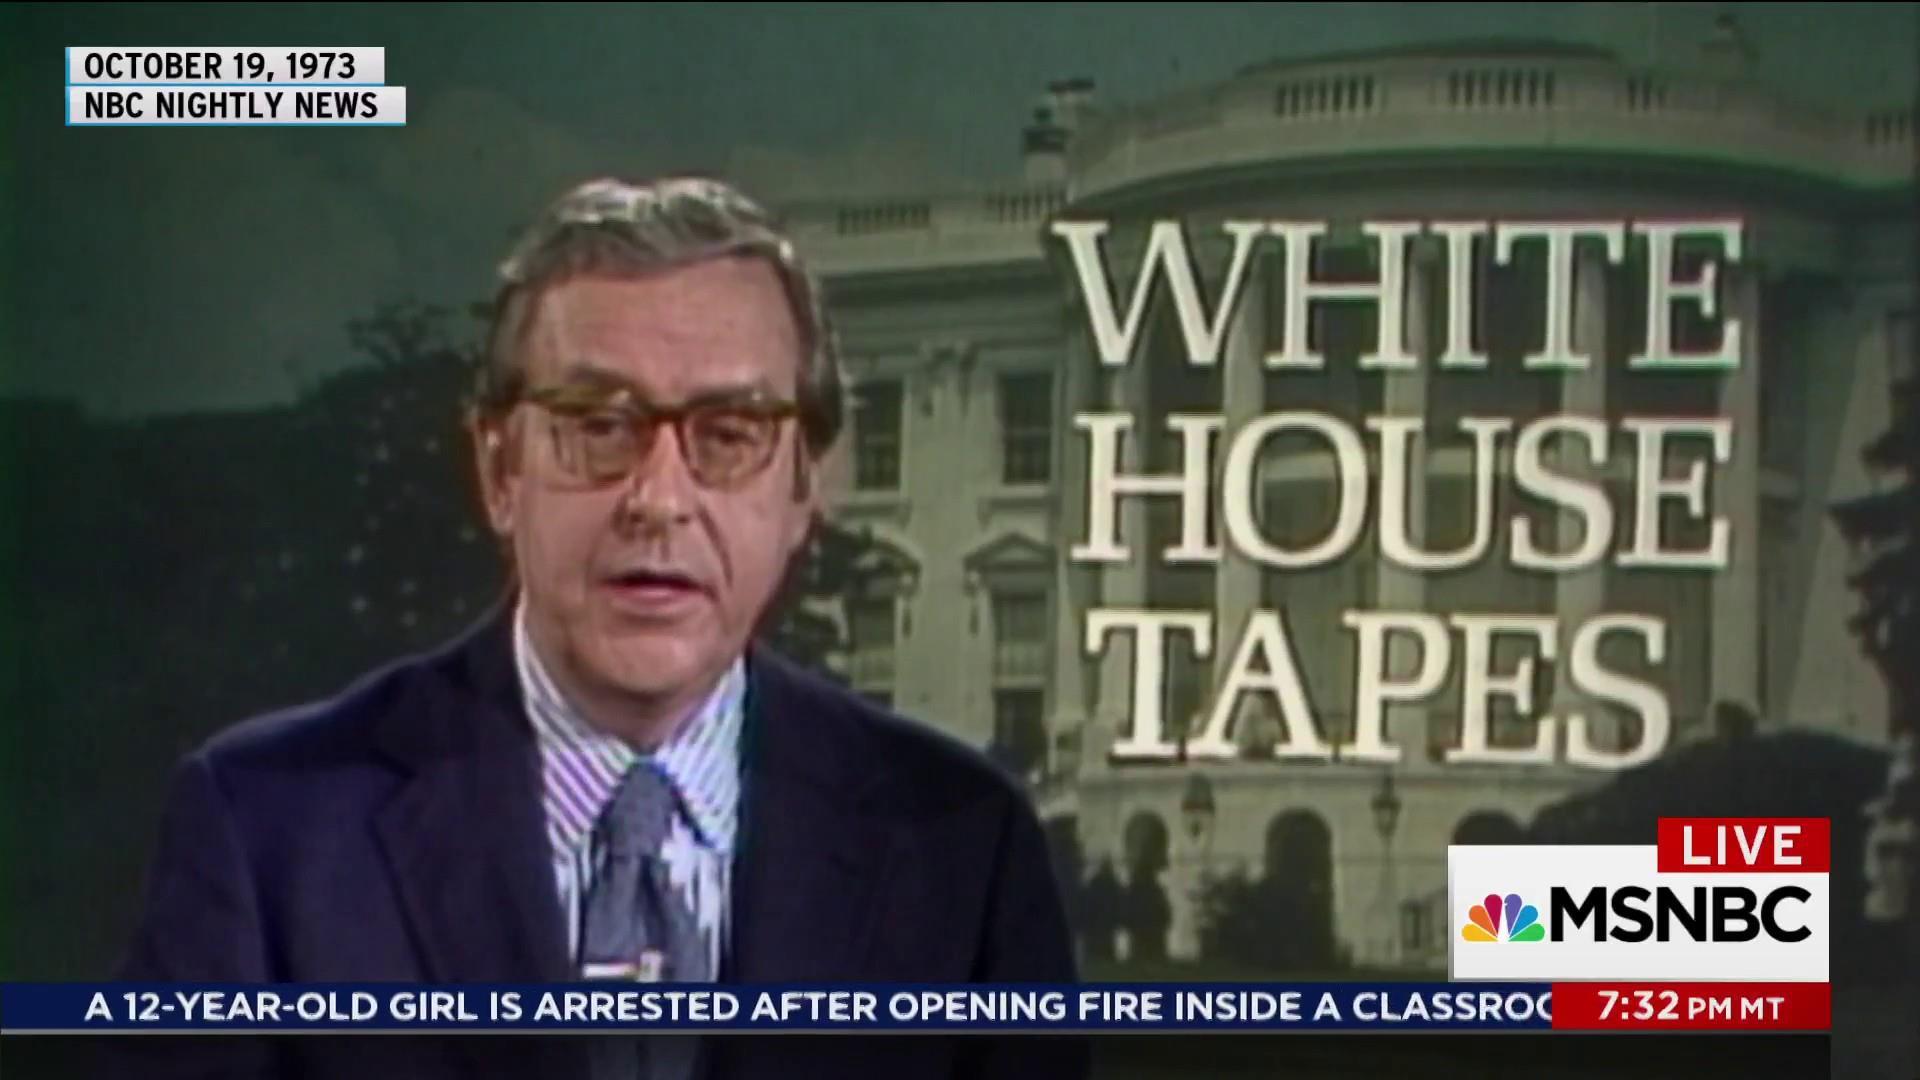 Suspenseful Friday before Nixon's Saturday night massacre